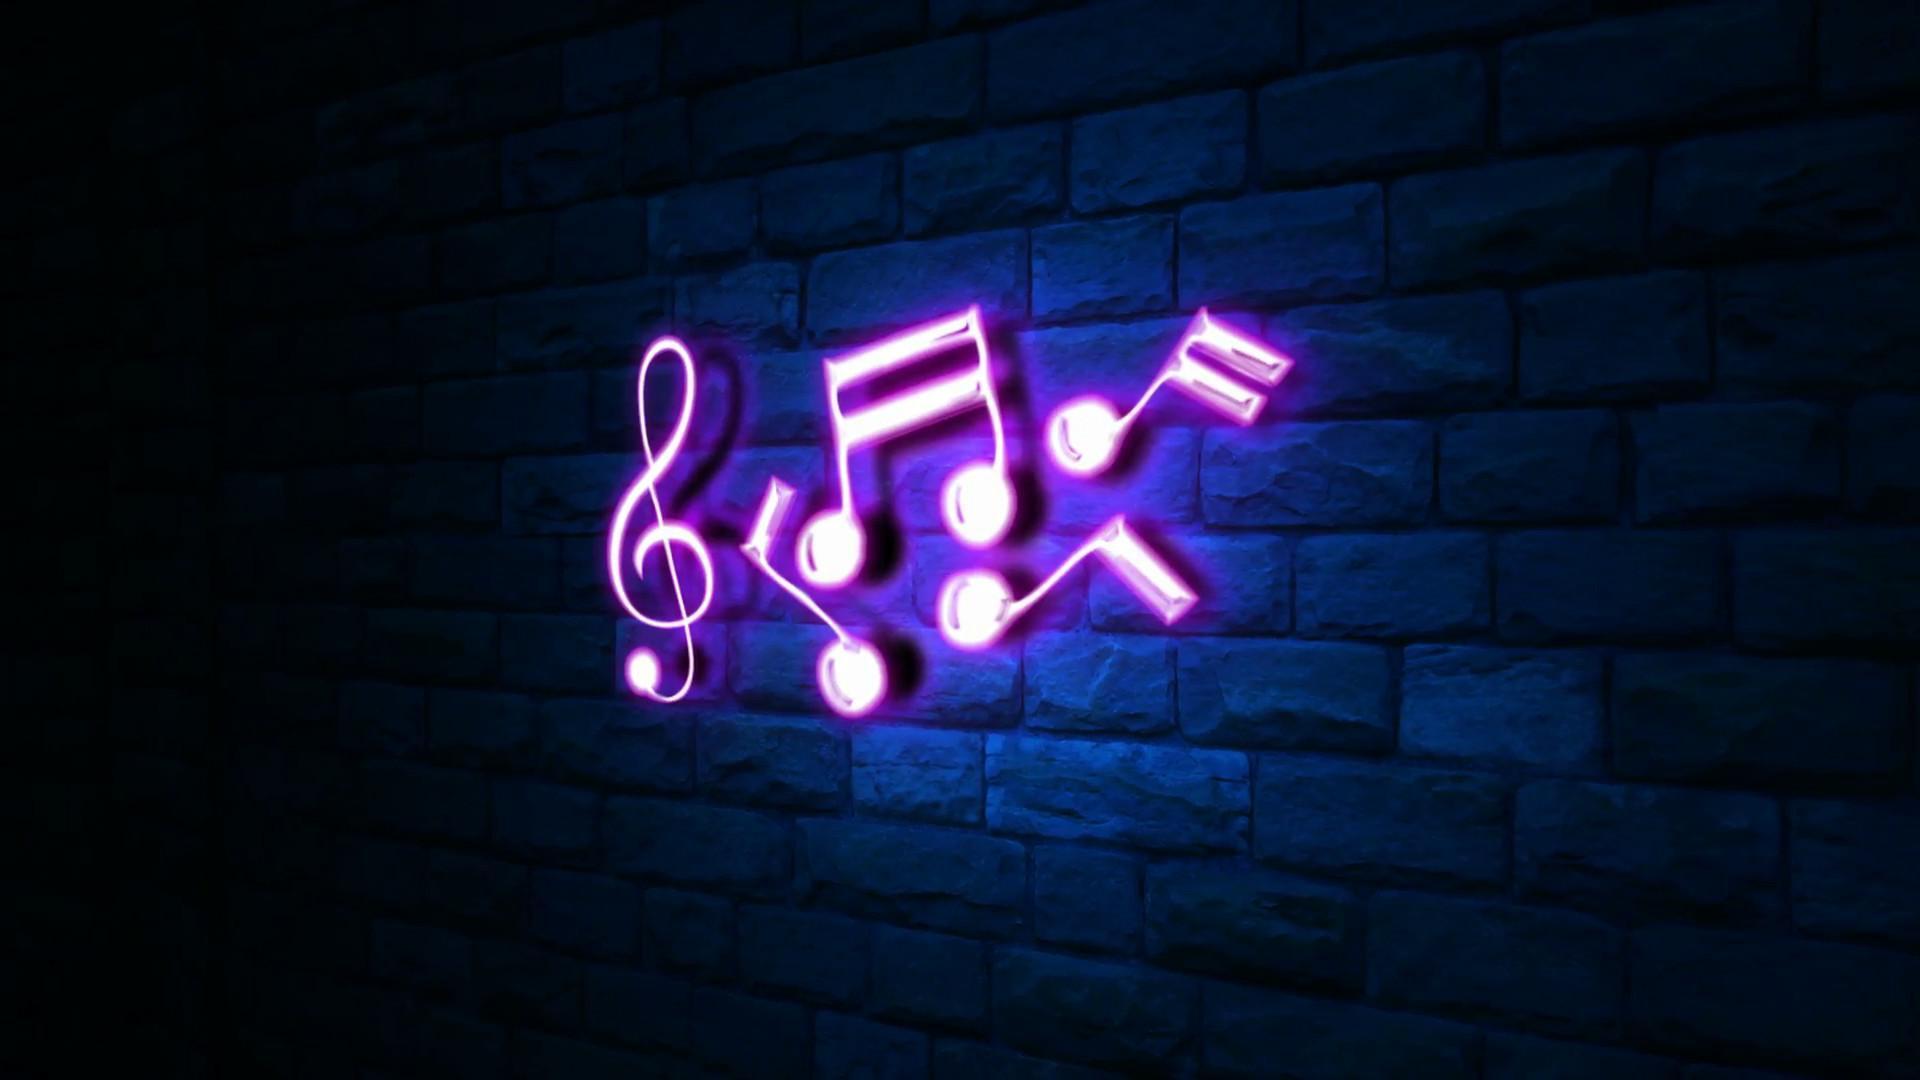 Music Aesthetic Desktop Wallpapers Top Free Music Aesthetic Desktop Backgrounds Wallpaperaccess